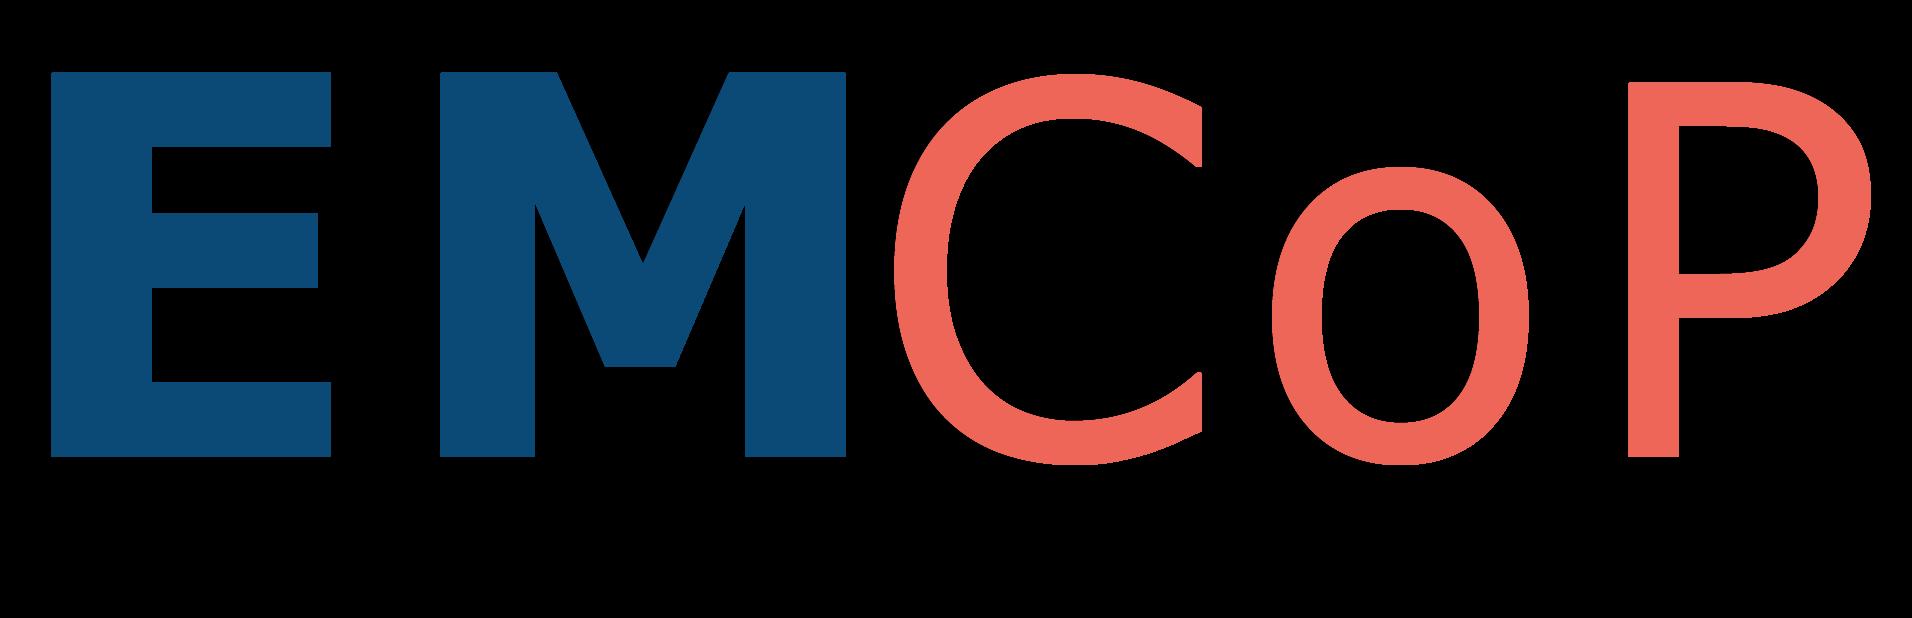 Emerging Media Community of Practice